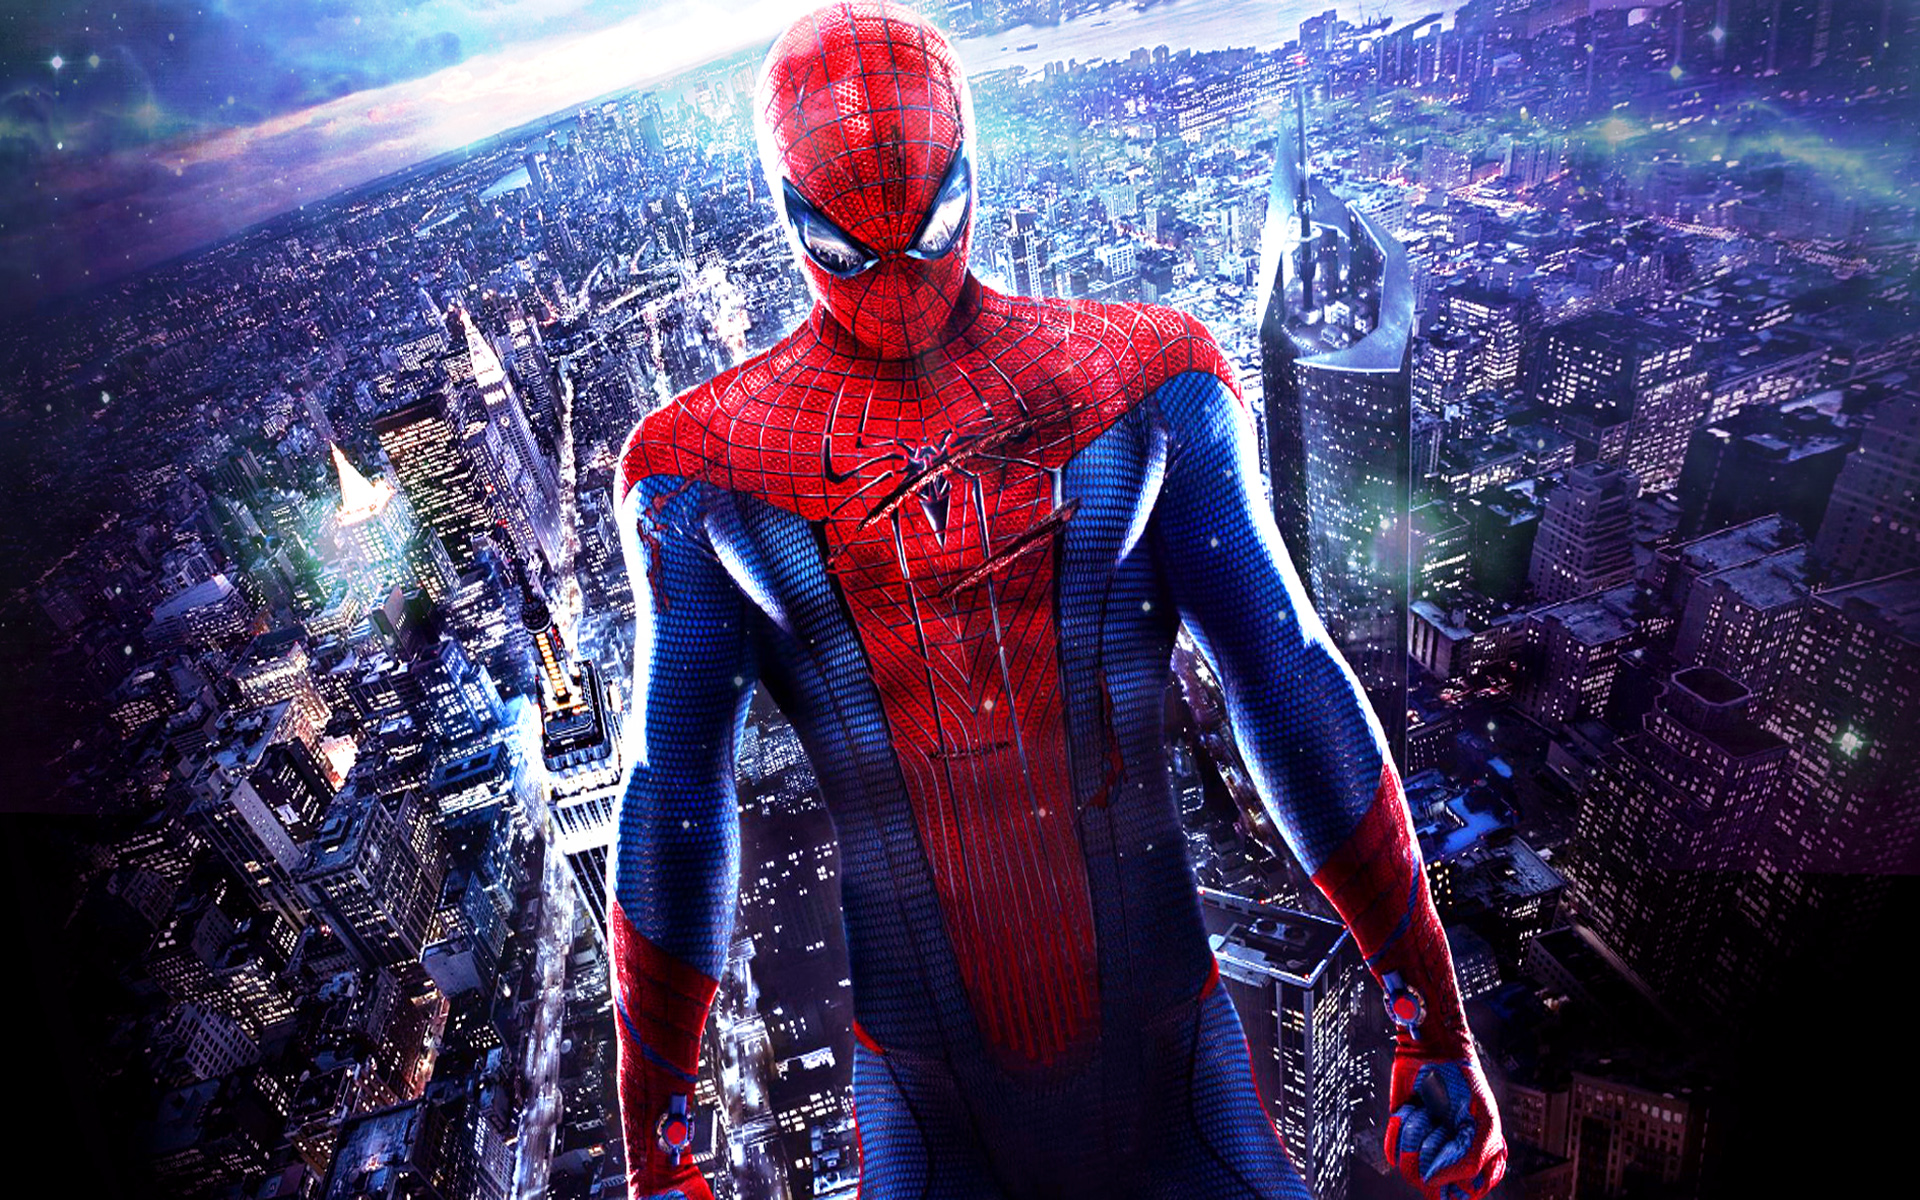 Wallpaper Spider Man Pictures 1920x1200